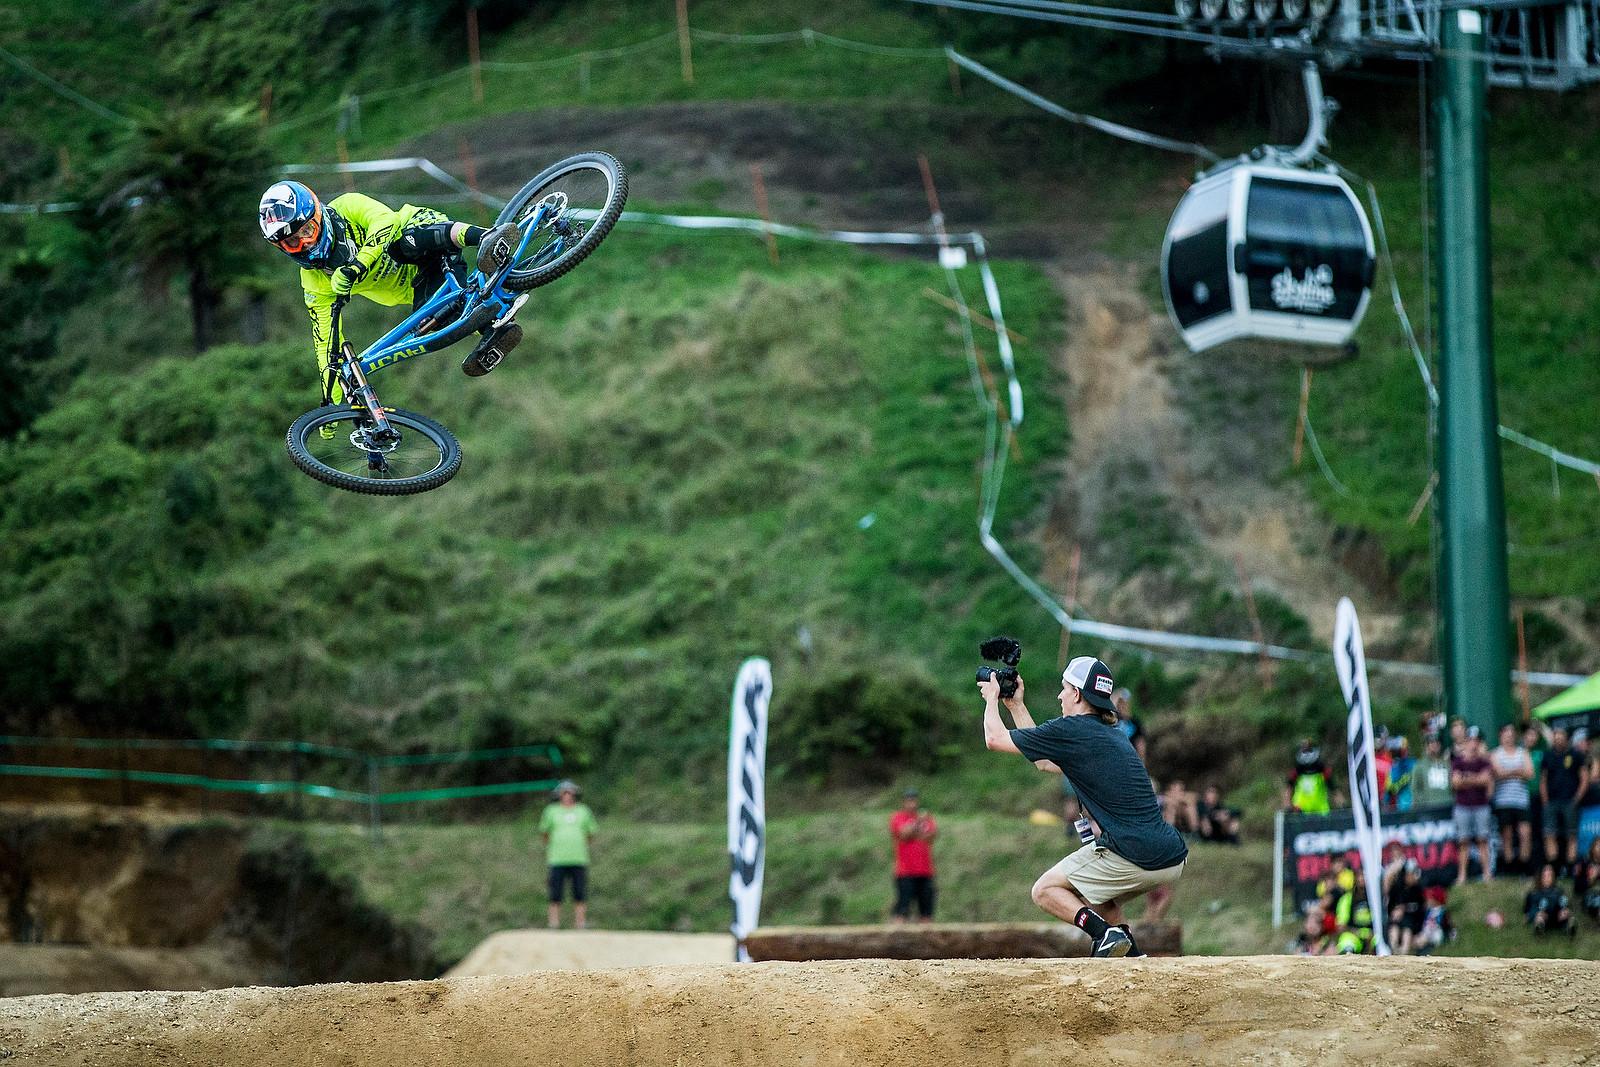 Bernard Kerr - Whip Off Madness from Crankworx NZ - Mountain Biking Pictures - Vital MTB